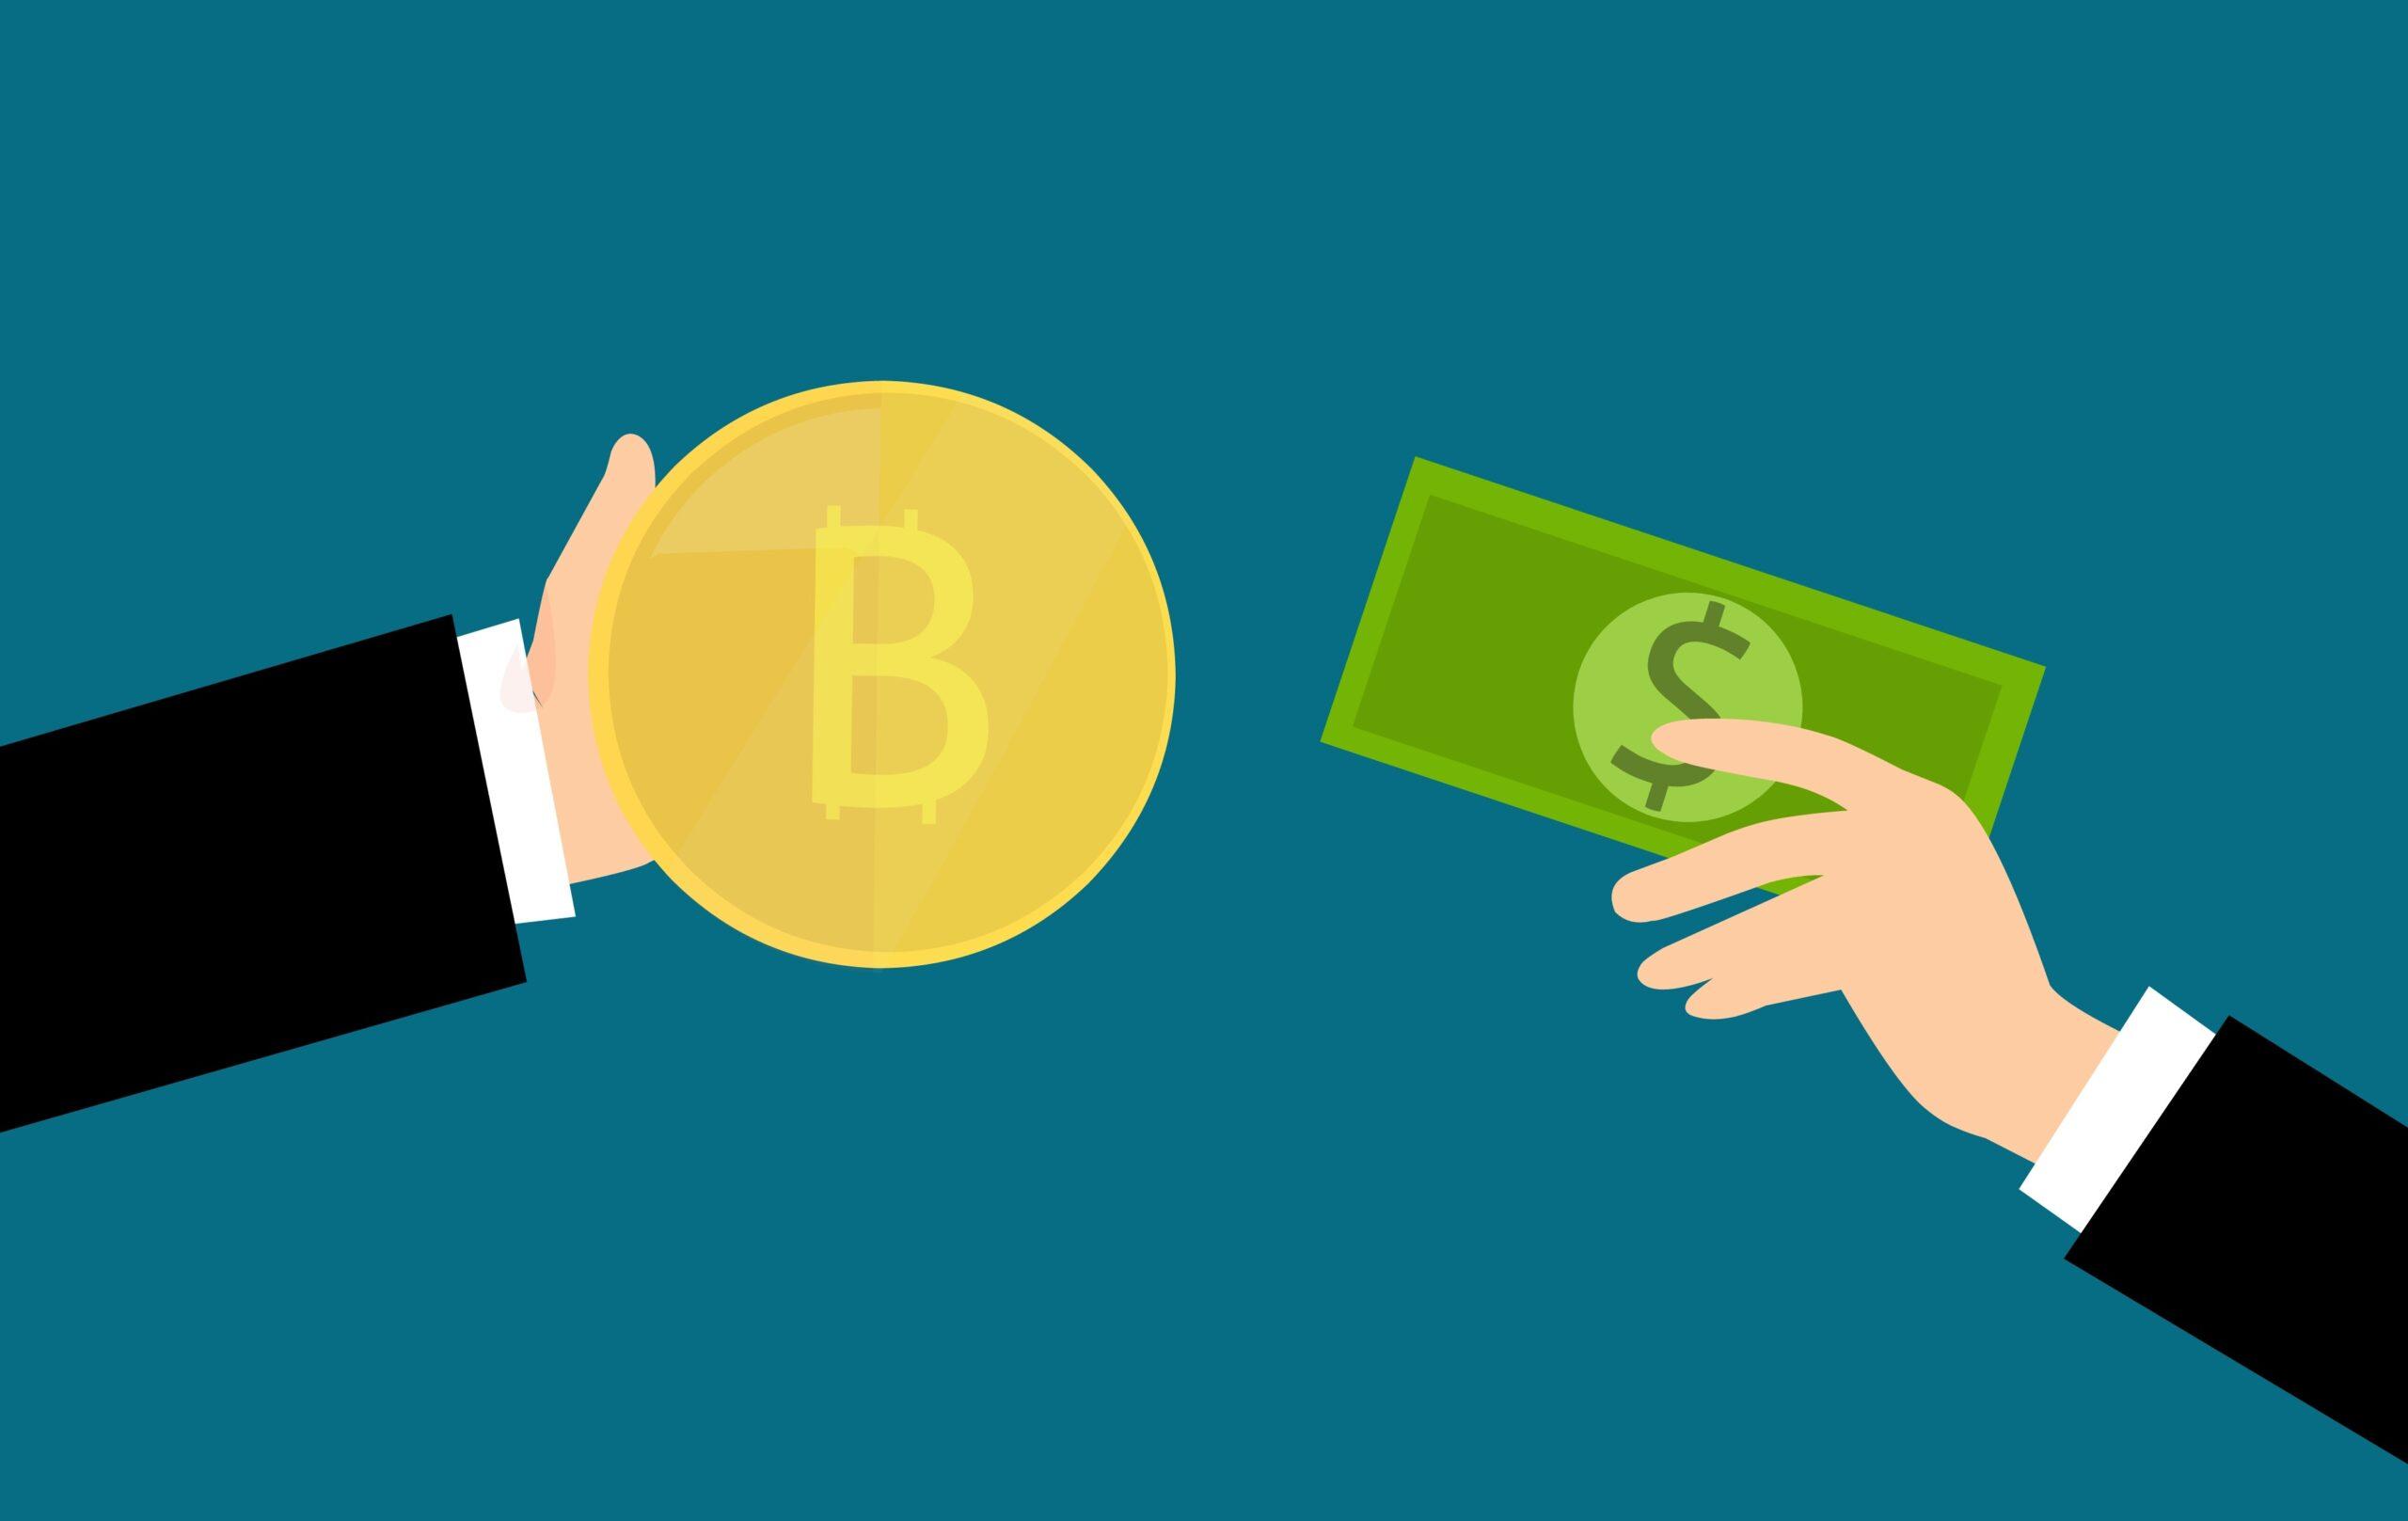 comprar bitcoins okpay complaints